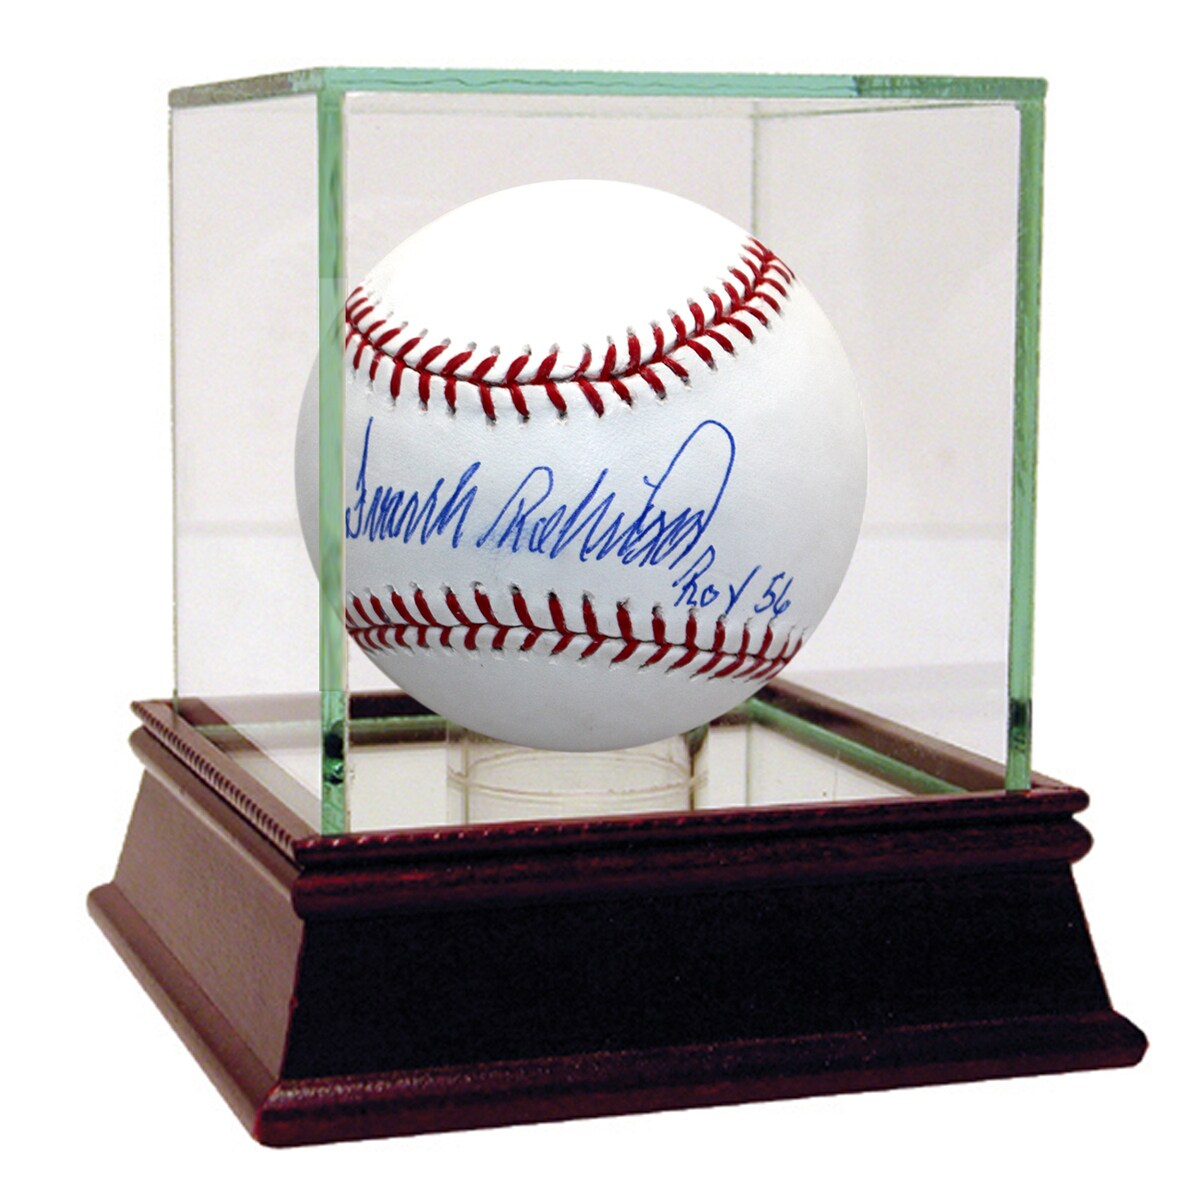 "Steiner Frank Robinson Signed MLB Baseball w/ ""roy 56"" in..."